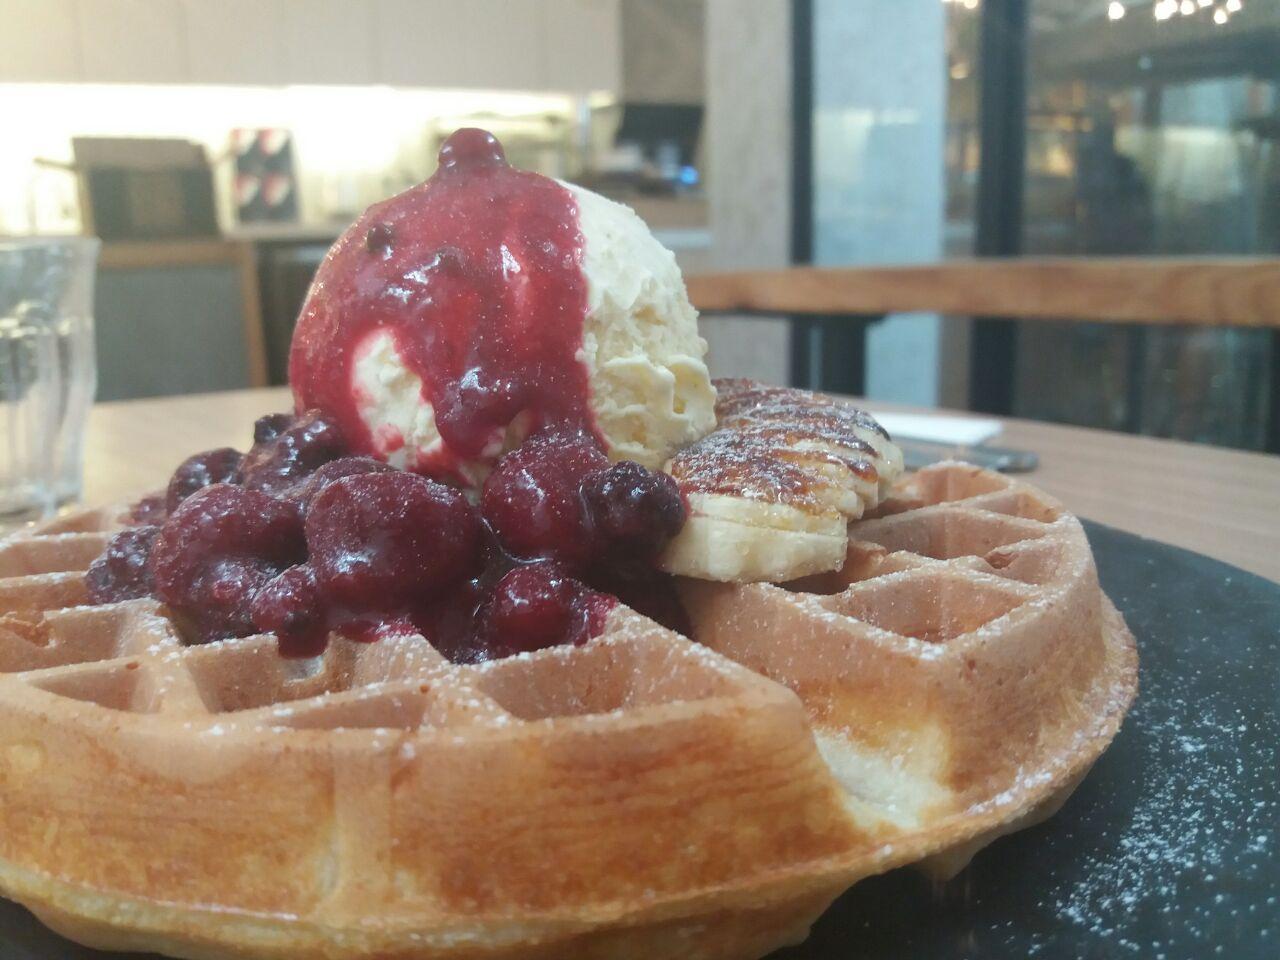 Berries Compote & Banana Brulee Waffle ($13.5)